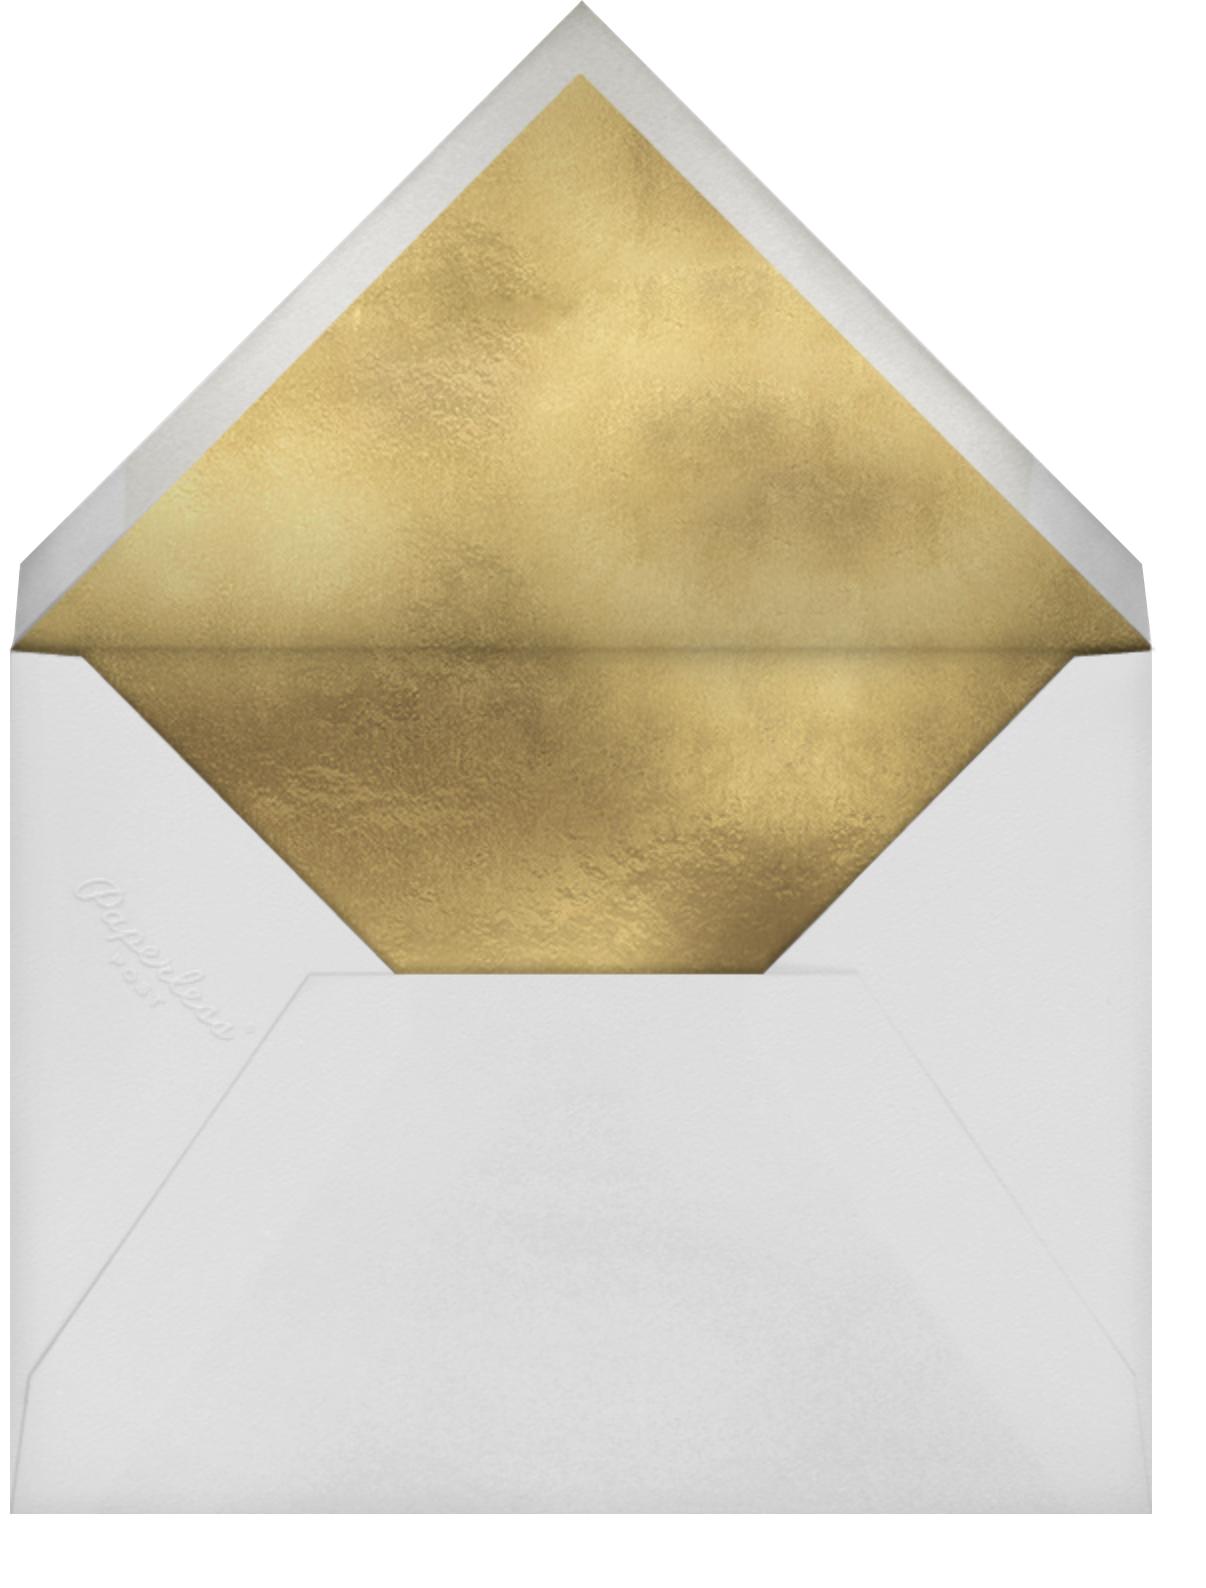 Better Daisies - Meringue - Mr. Boddington's Studio - Envelope